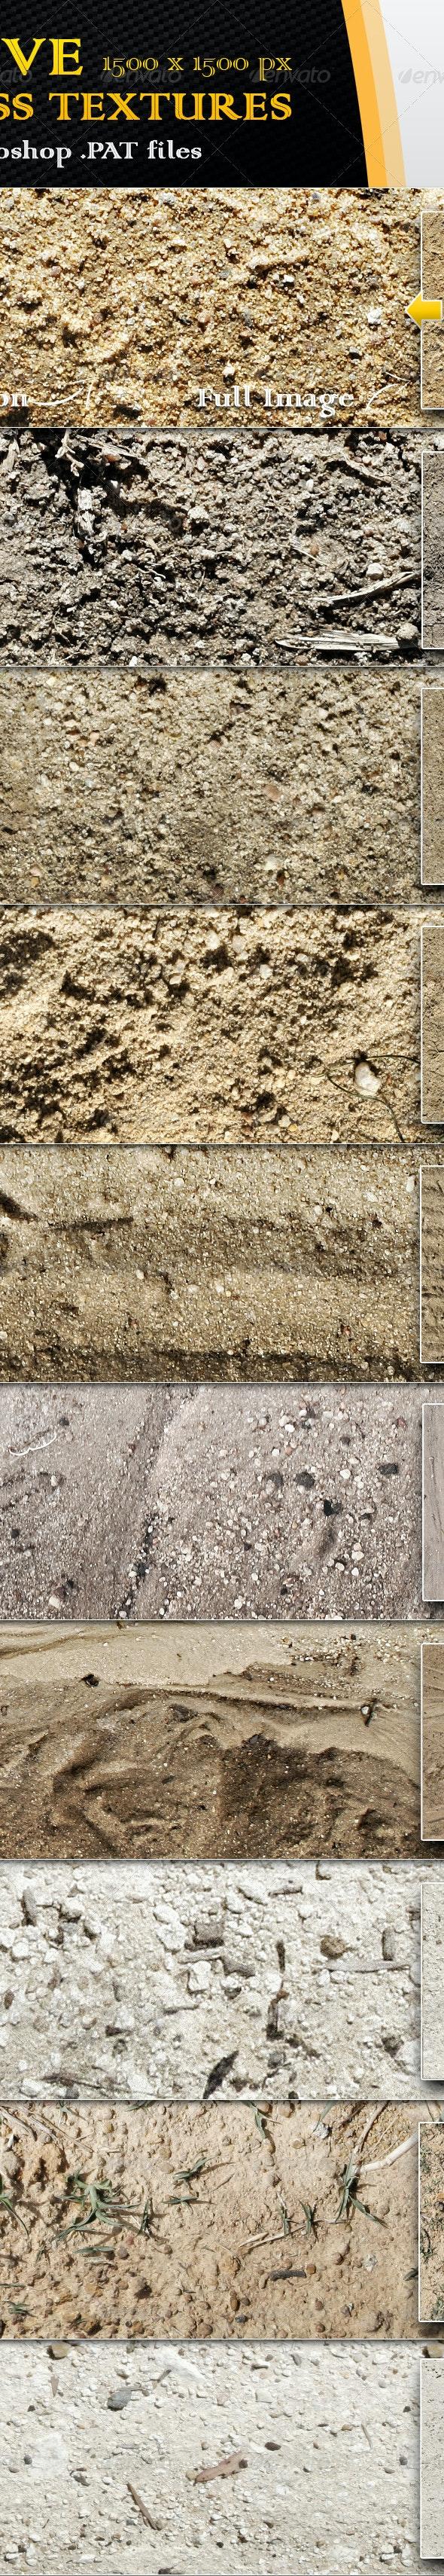 10 Seamless Sand Textures - Nature Textures / Fills / Patterns